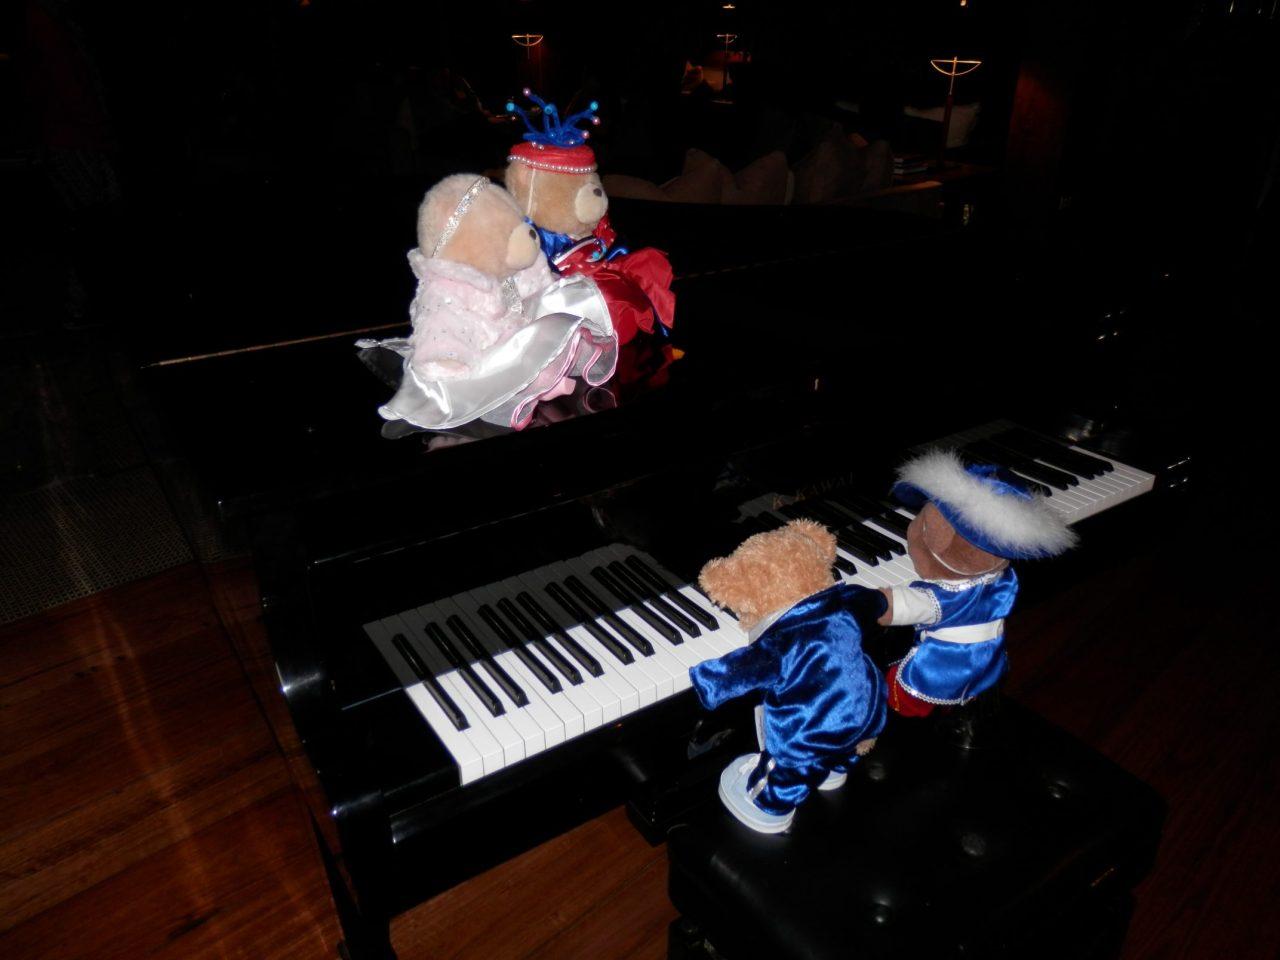 Clara Schumann's Pawsome PianoWorks